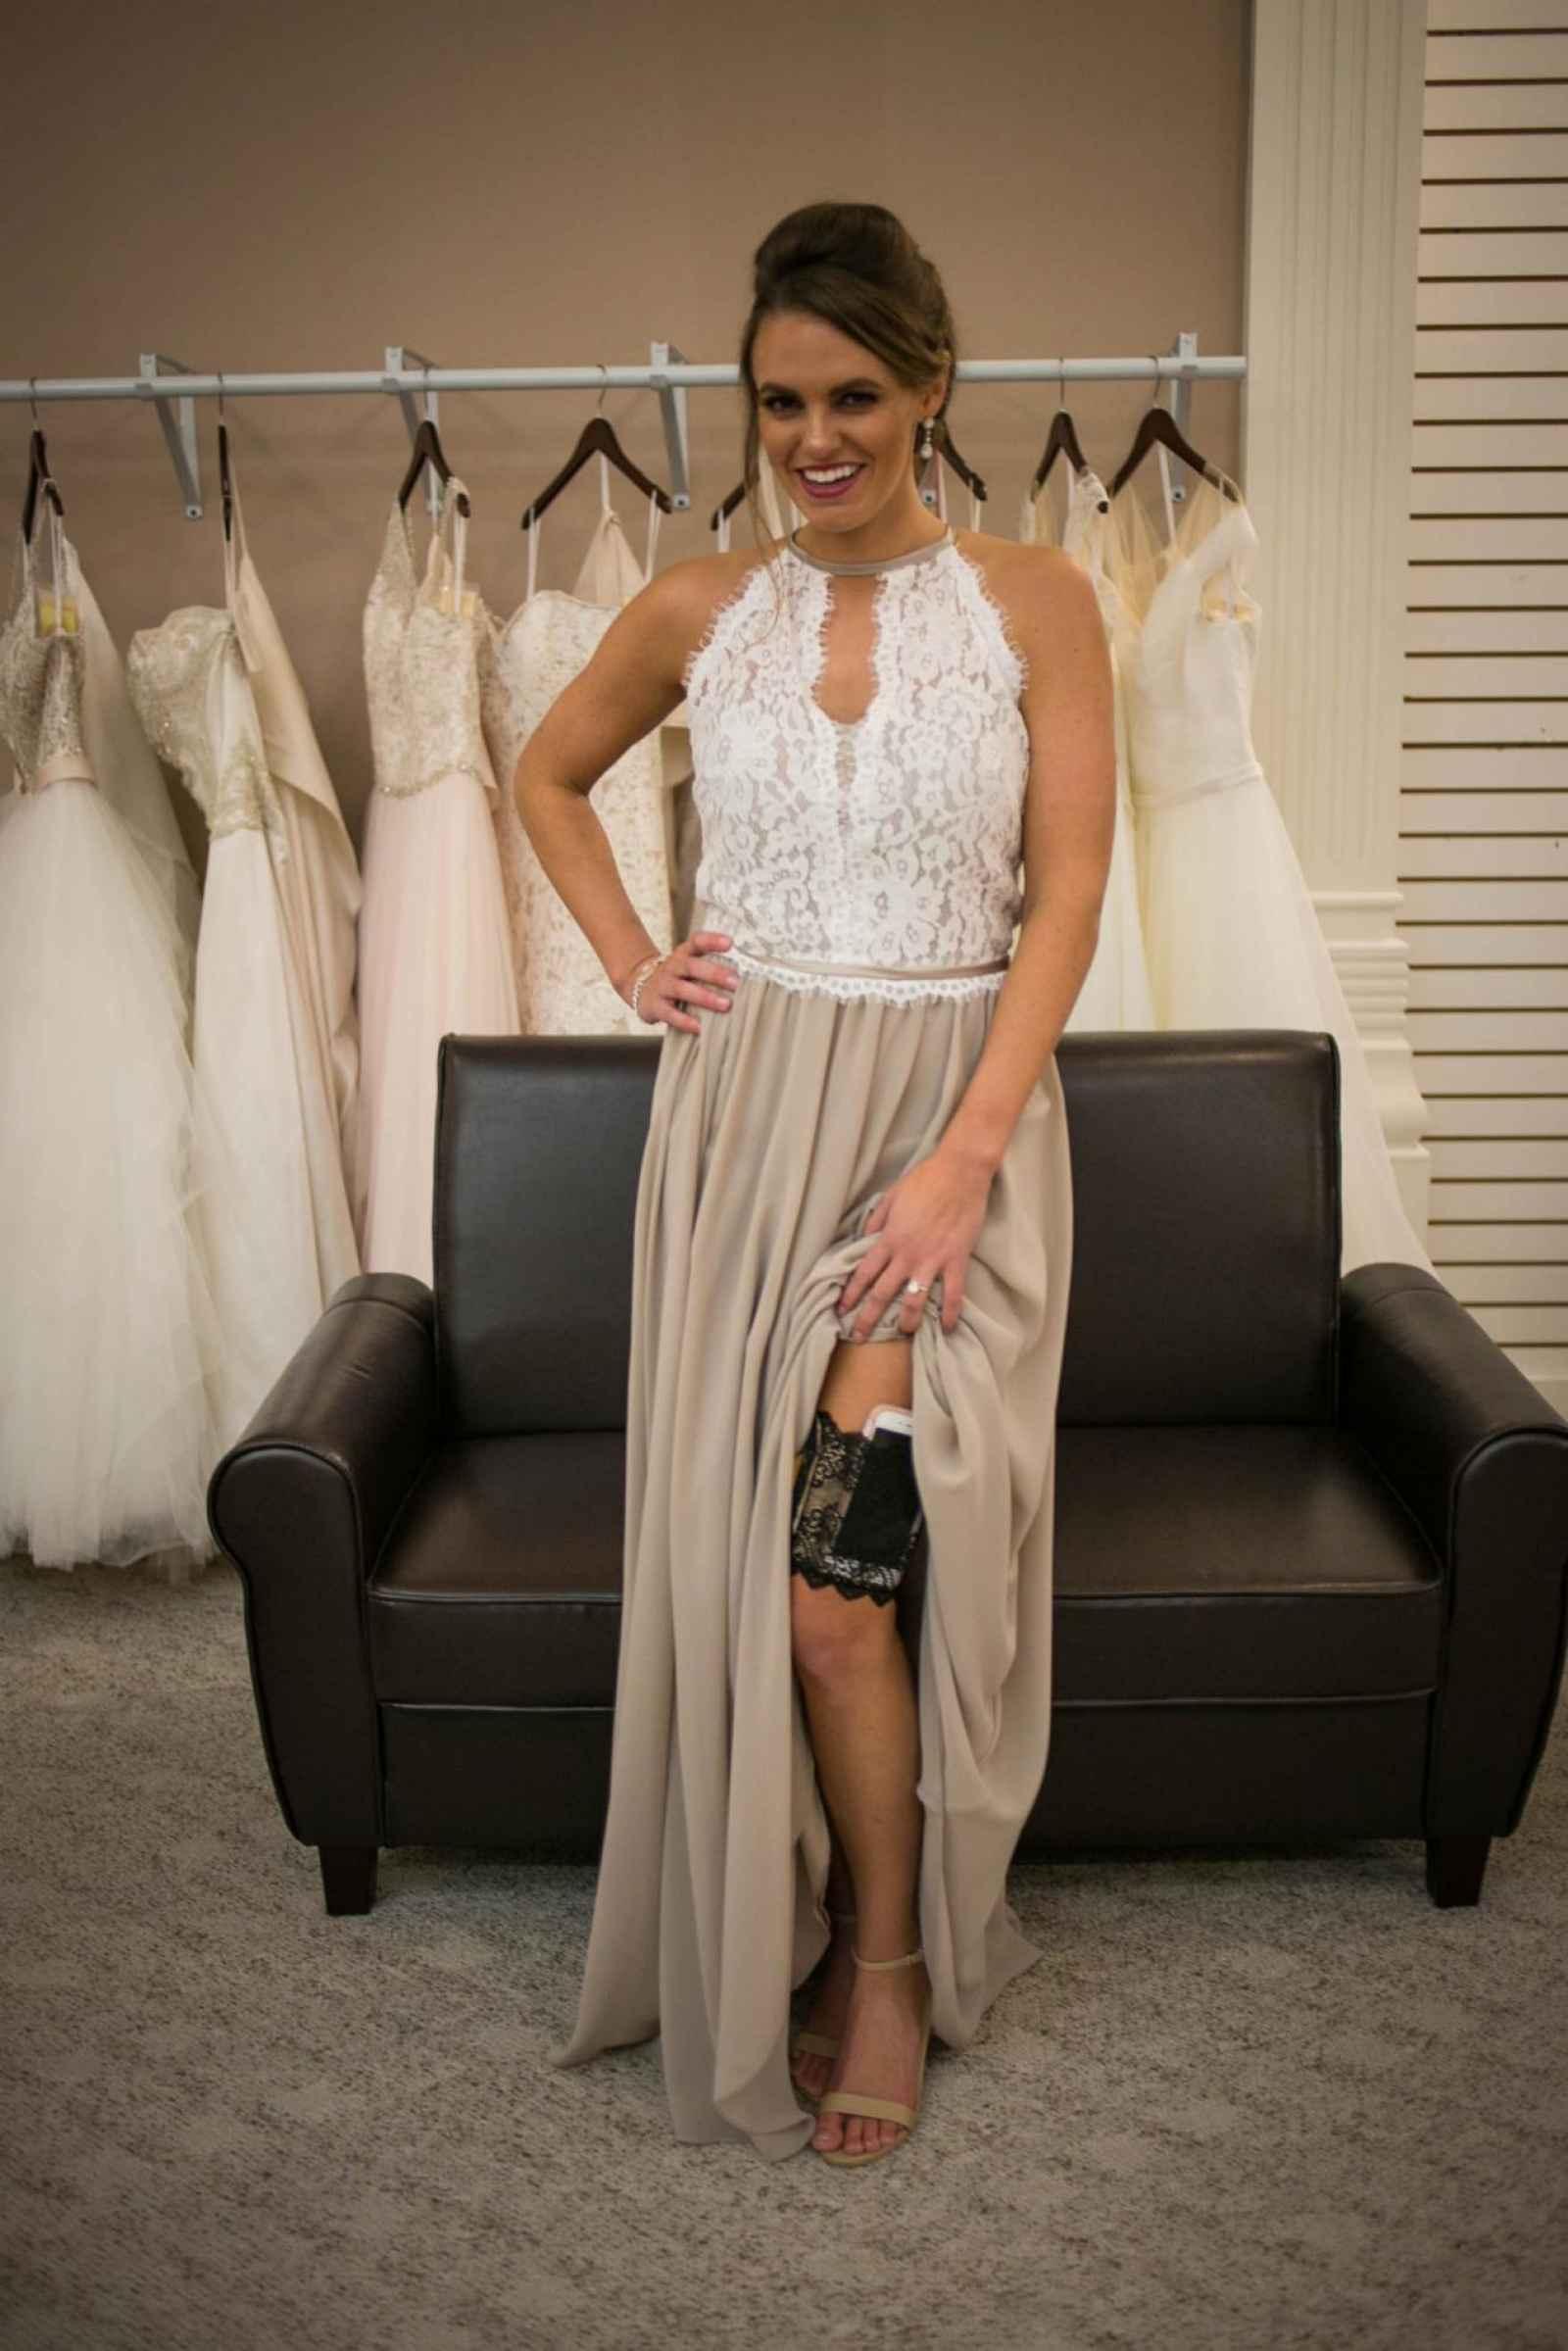 WeddingDay Exclusive That Special Touch Bridal Boutique  WeddingDay Magazine